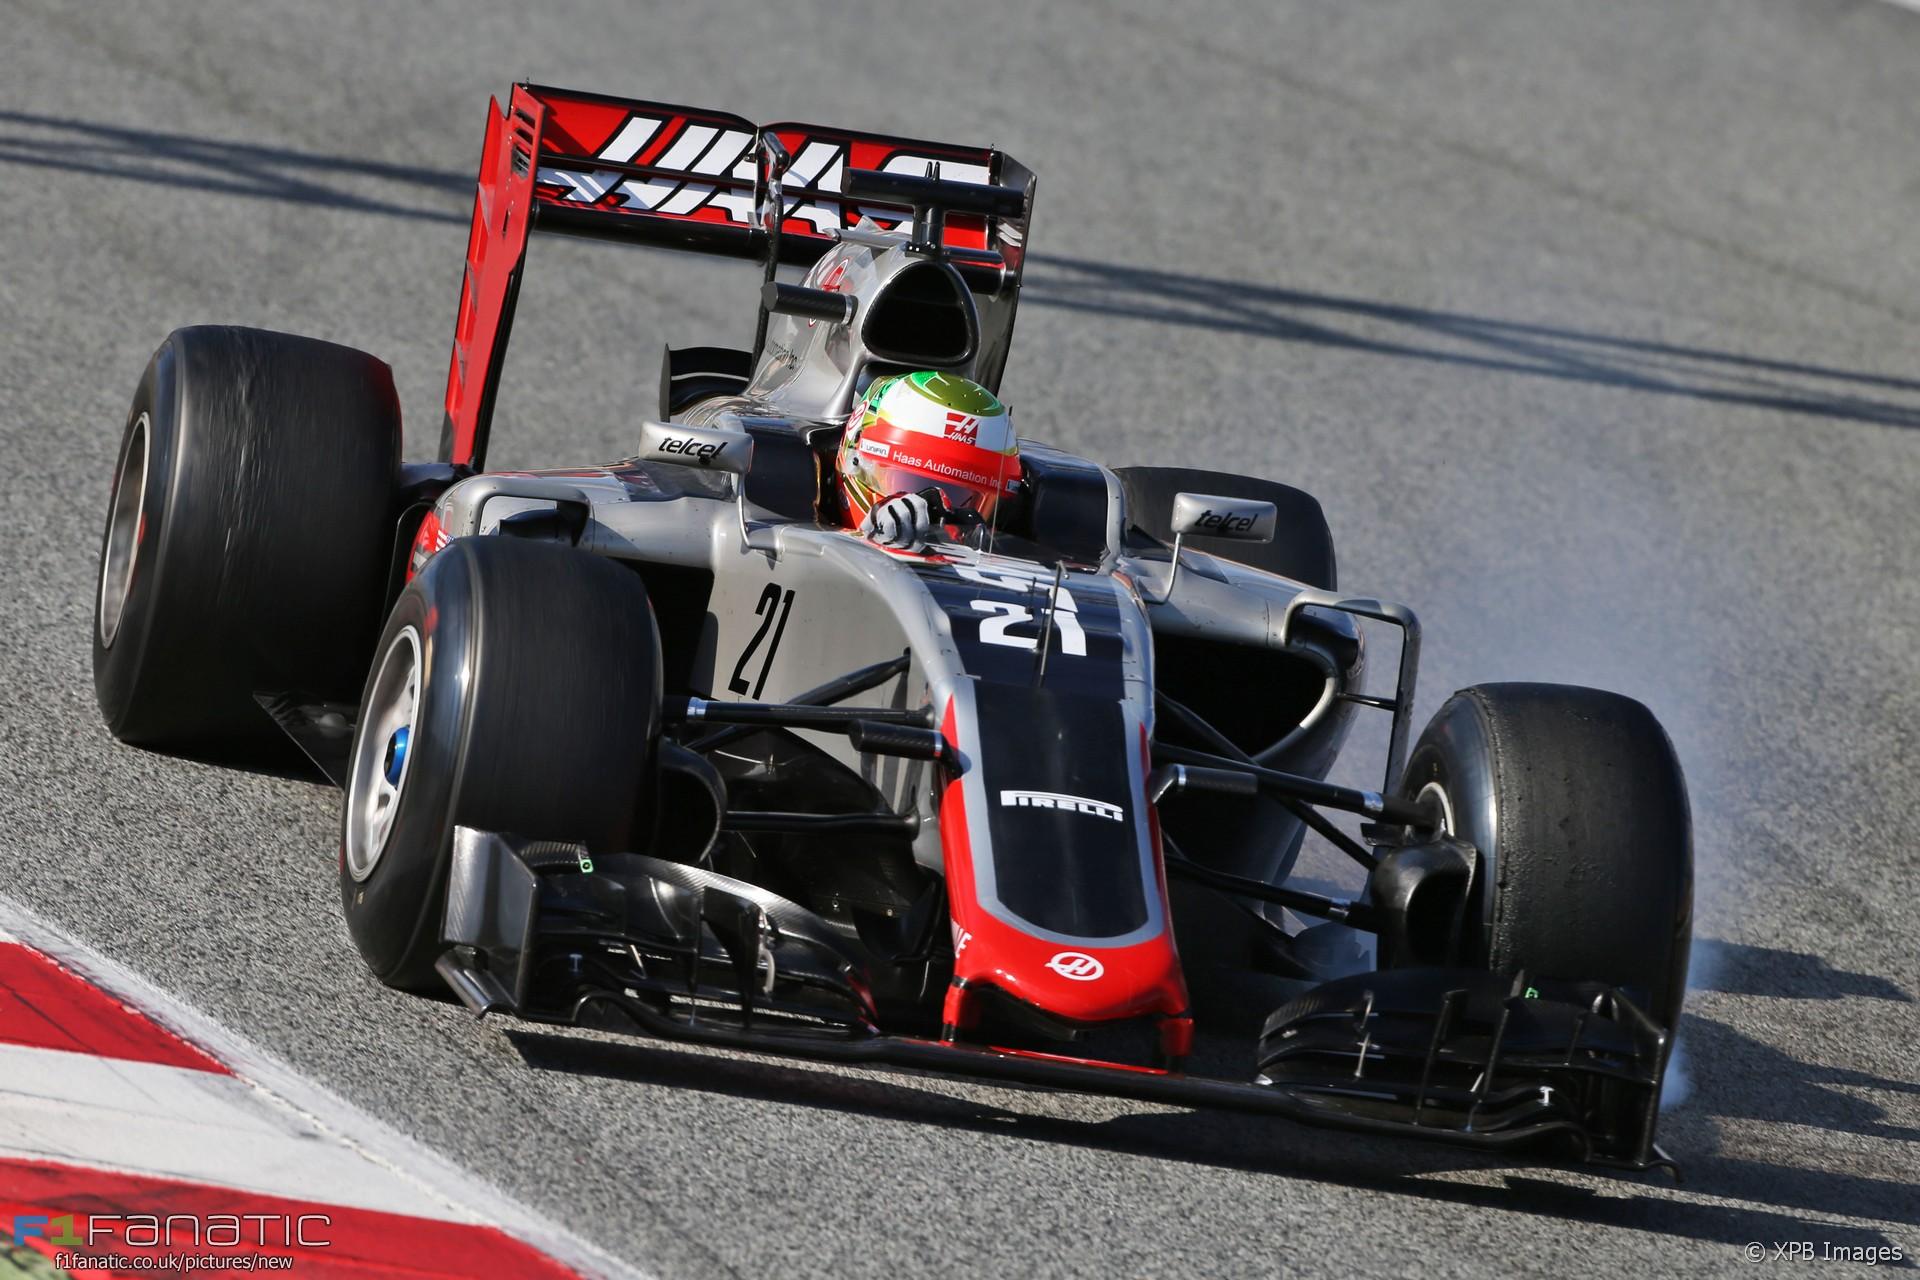 Esteban Gutierrez, Haas, Circuit de Catalunya, 2016